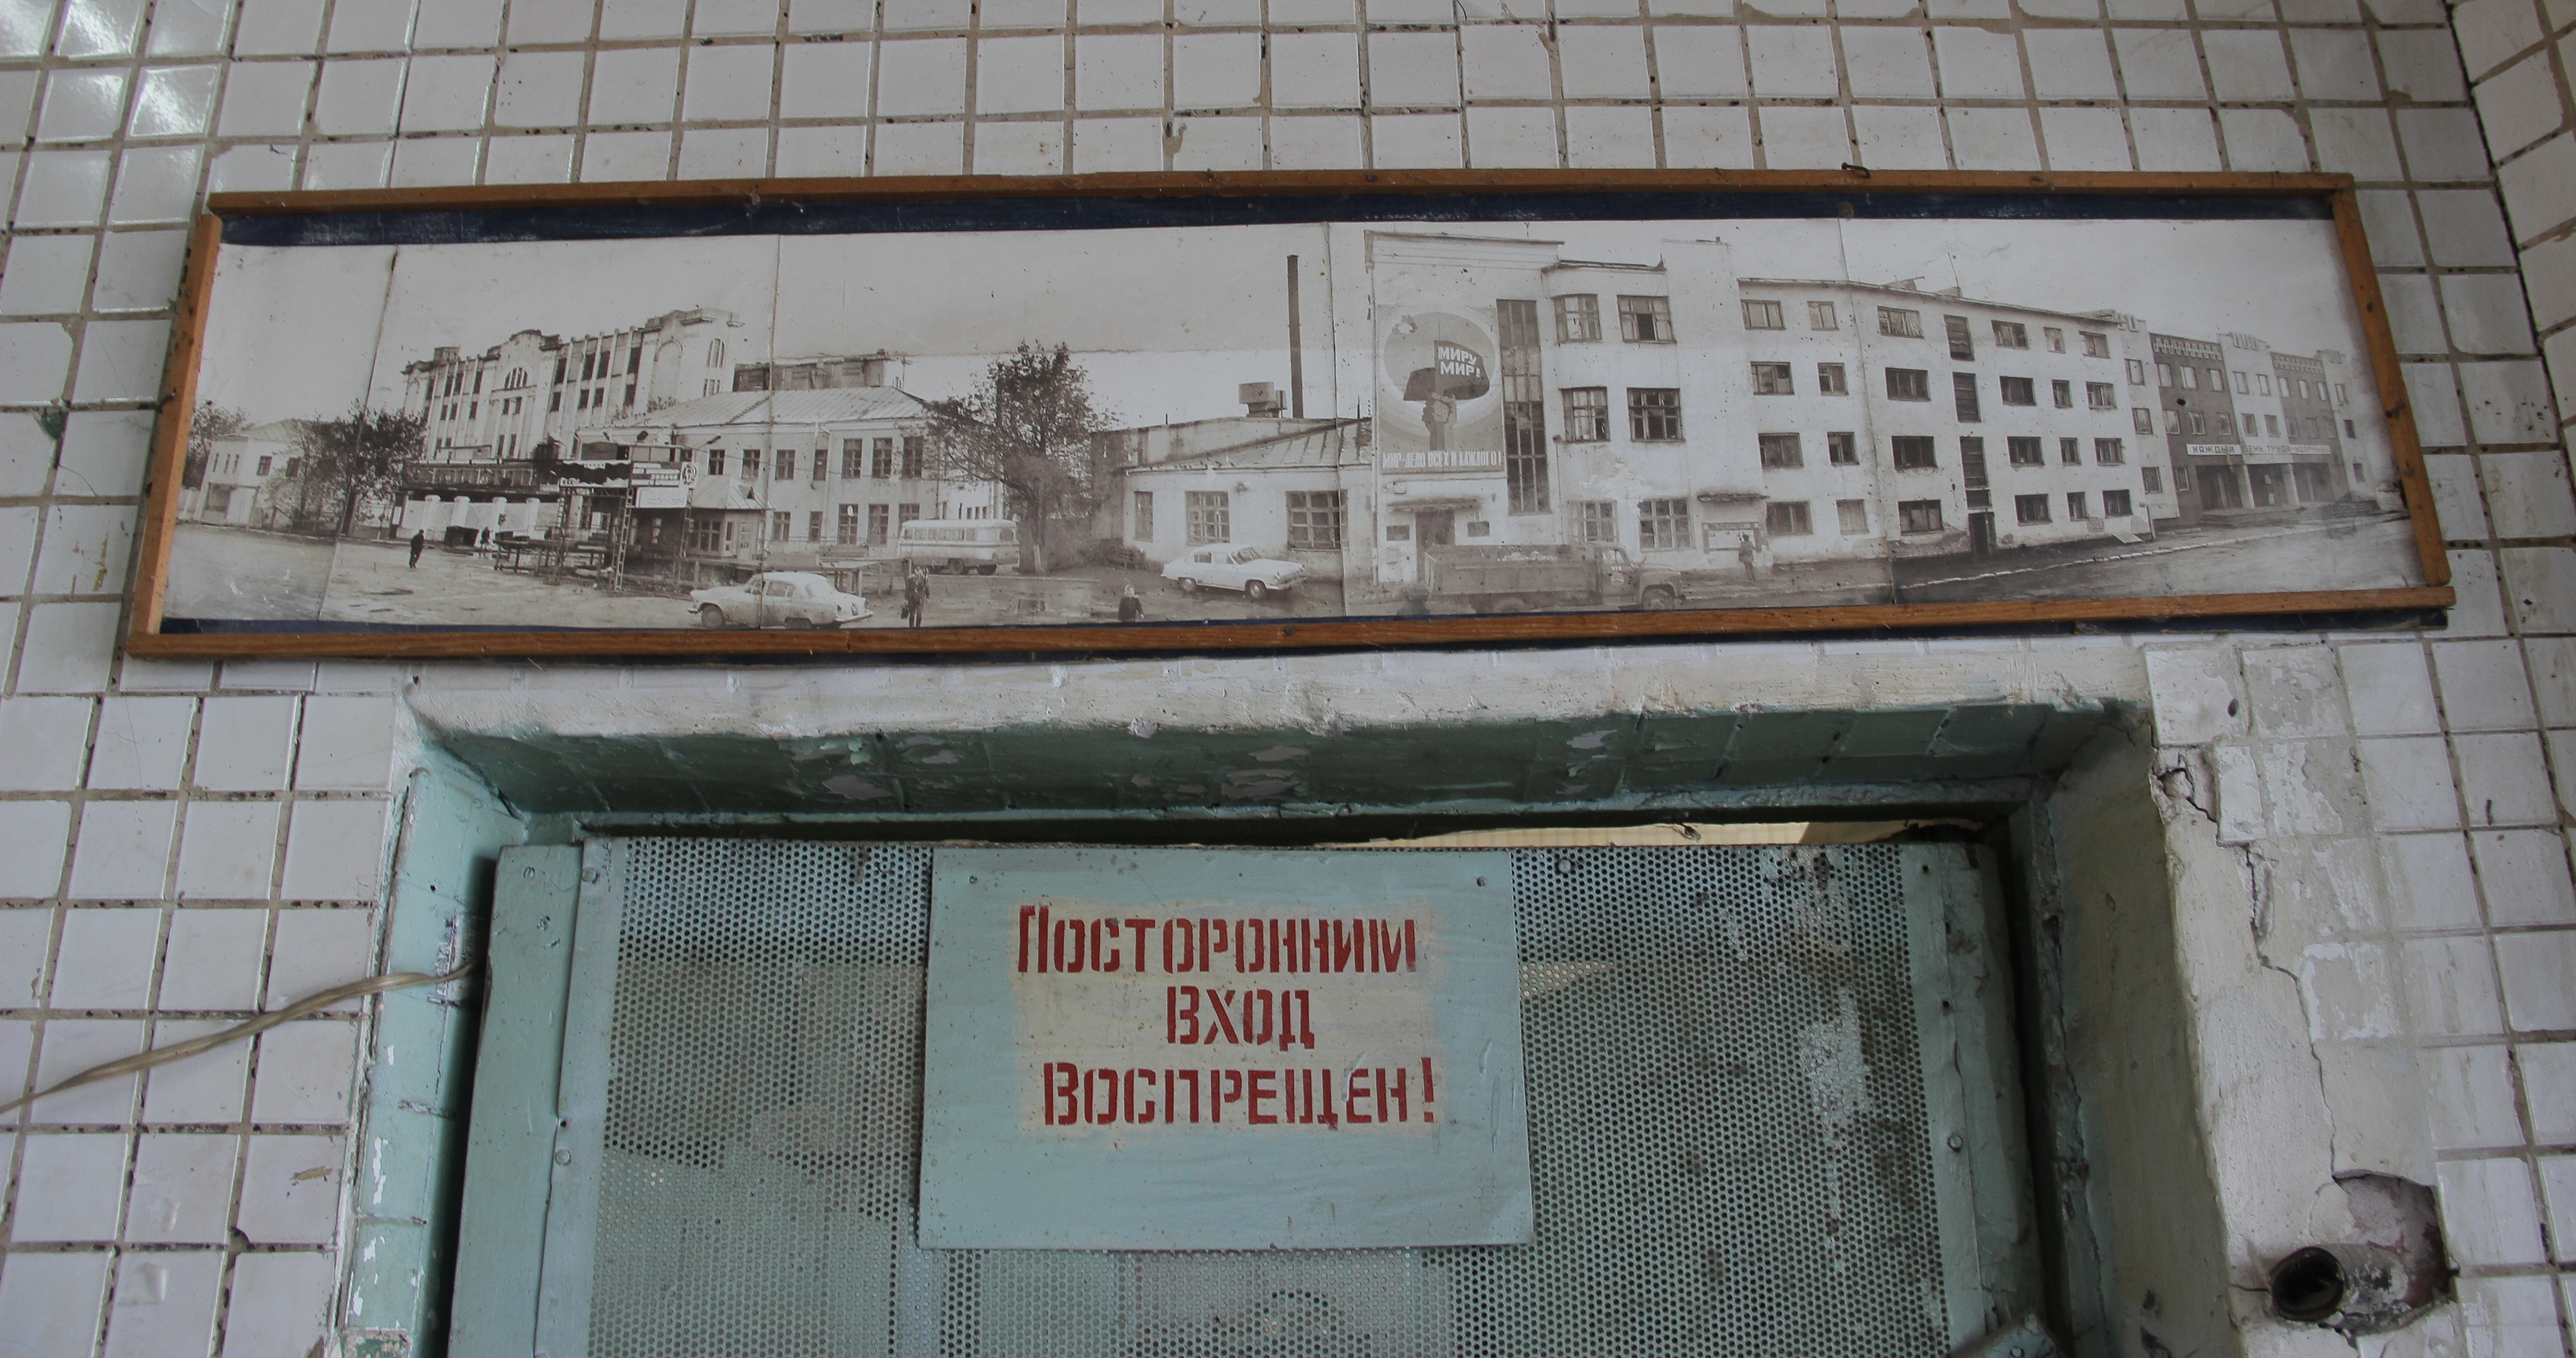 Походная комбикормового завода